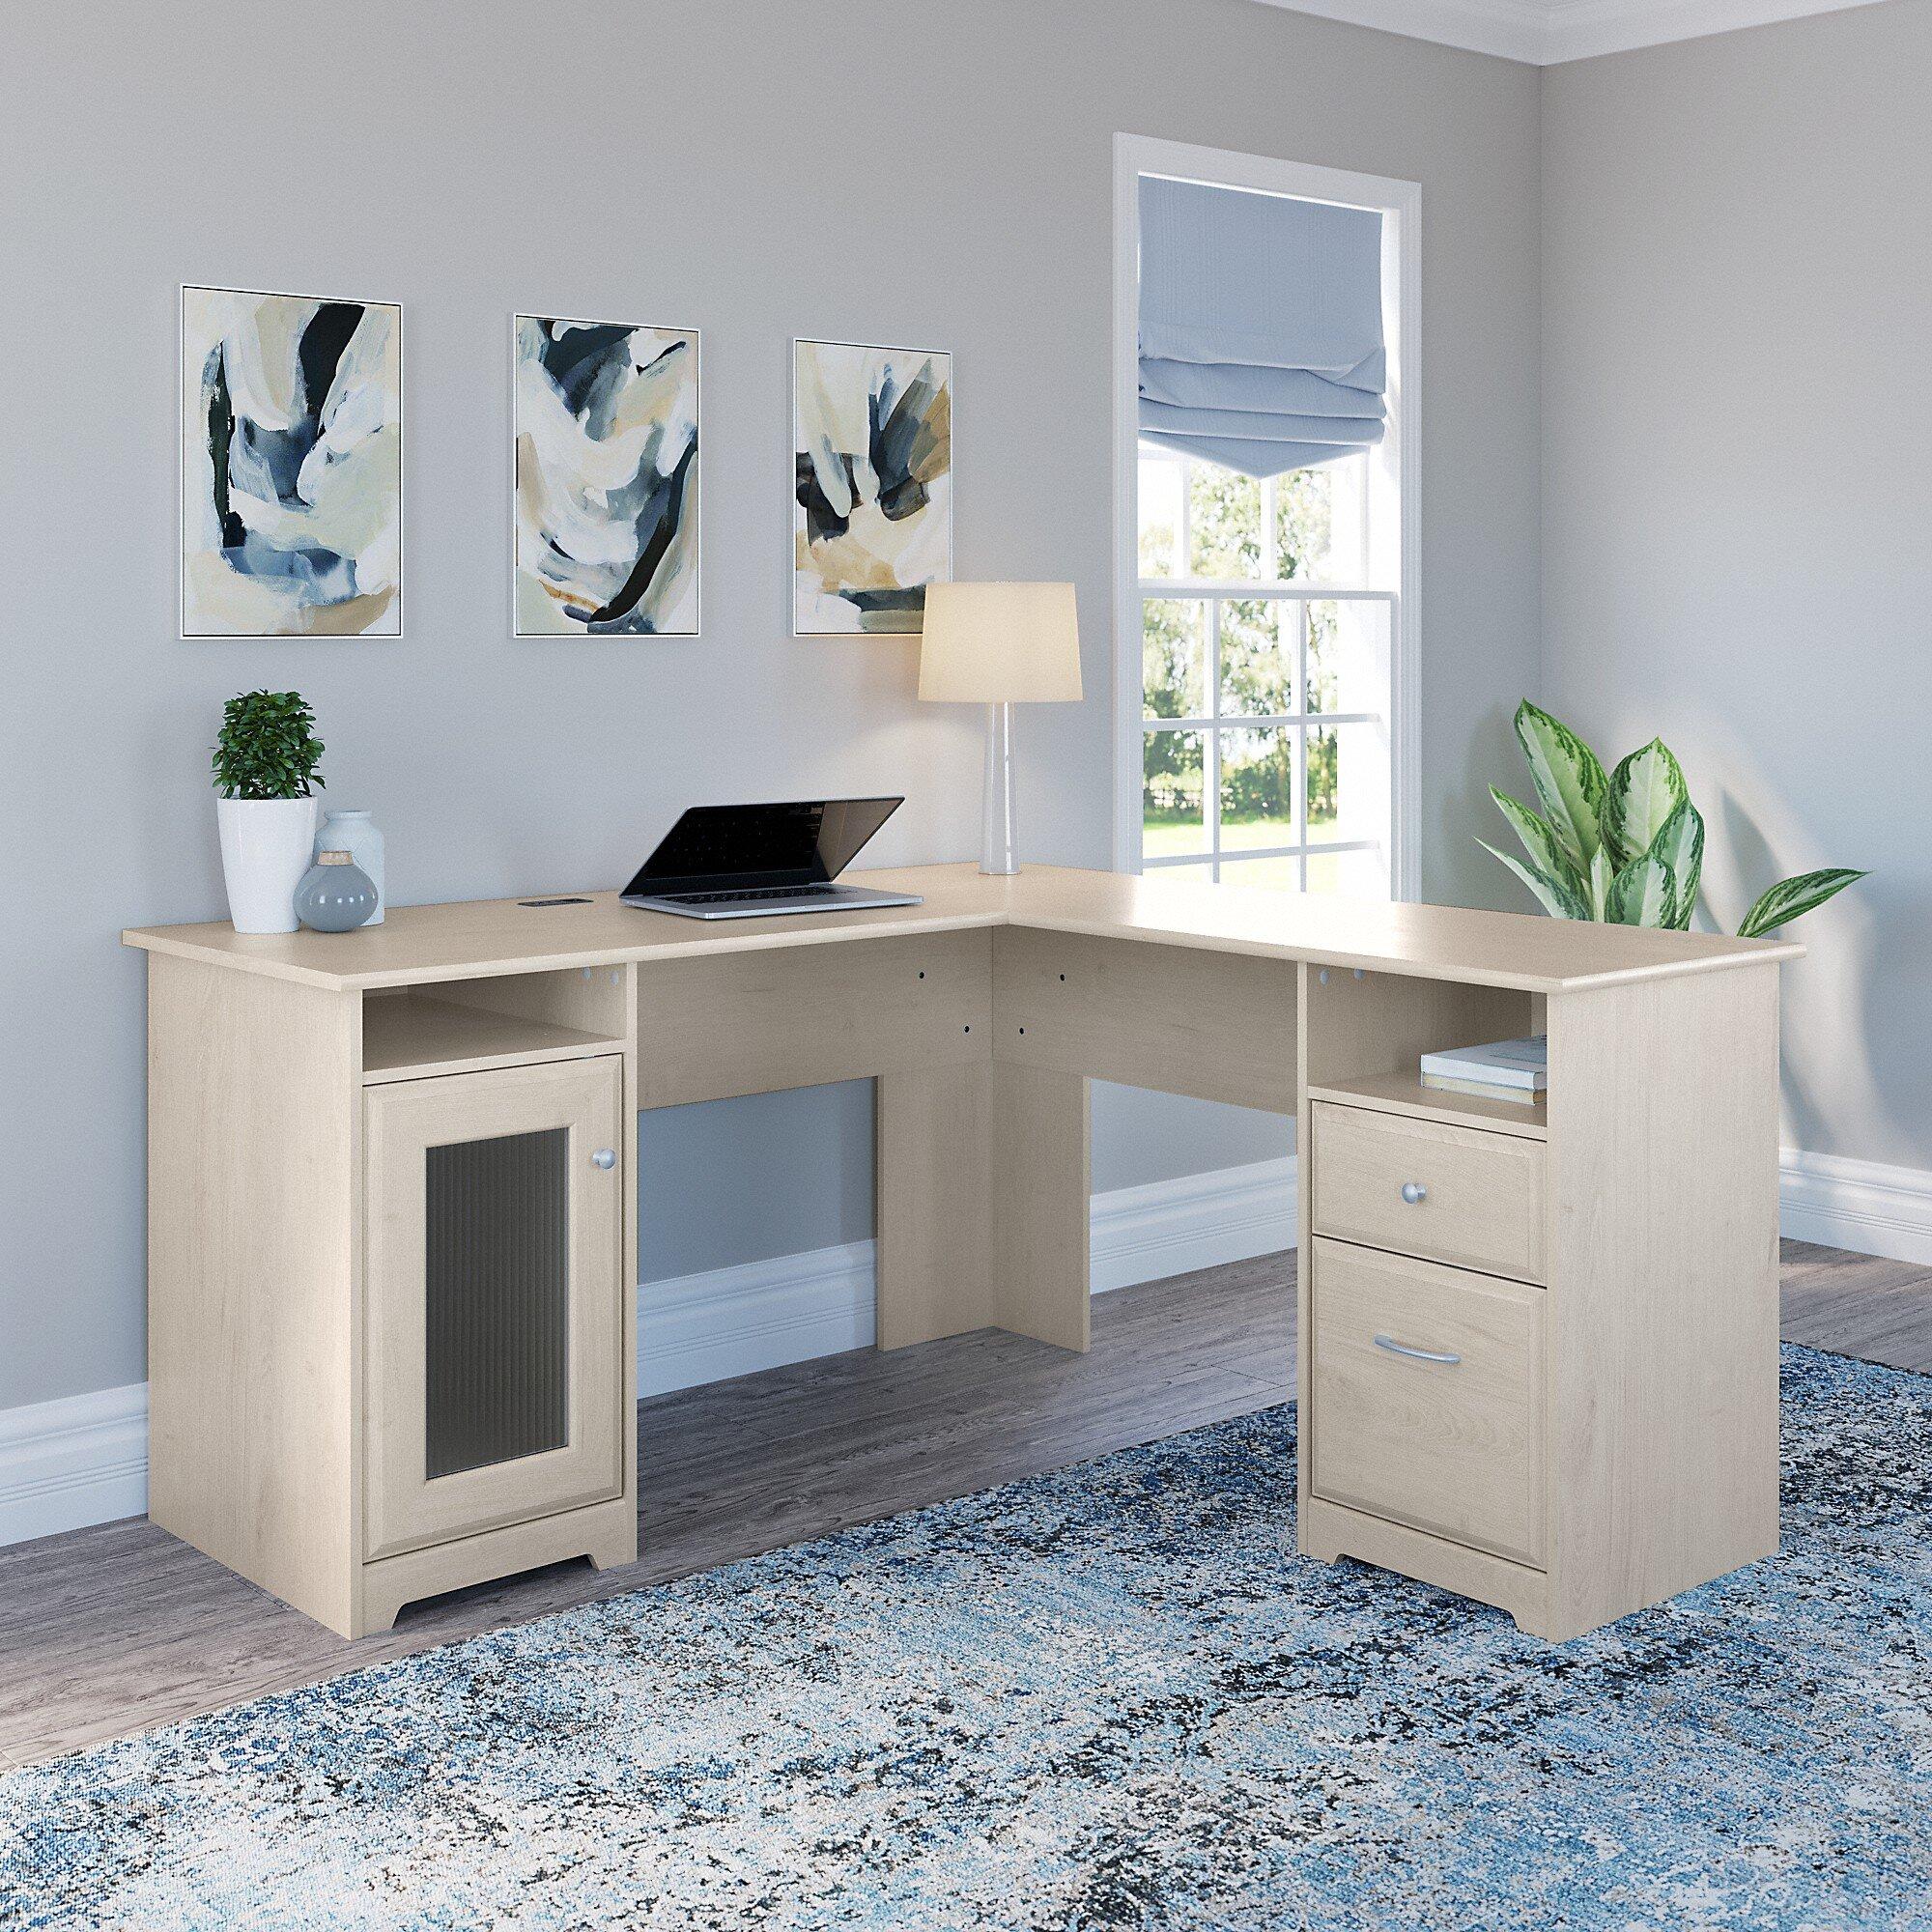 700+ Desks   FREE Shipping Over $12   Wayfair